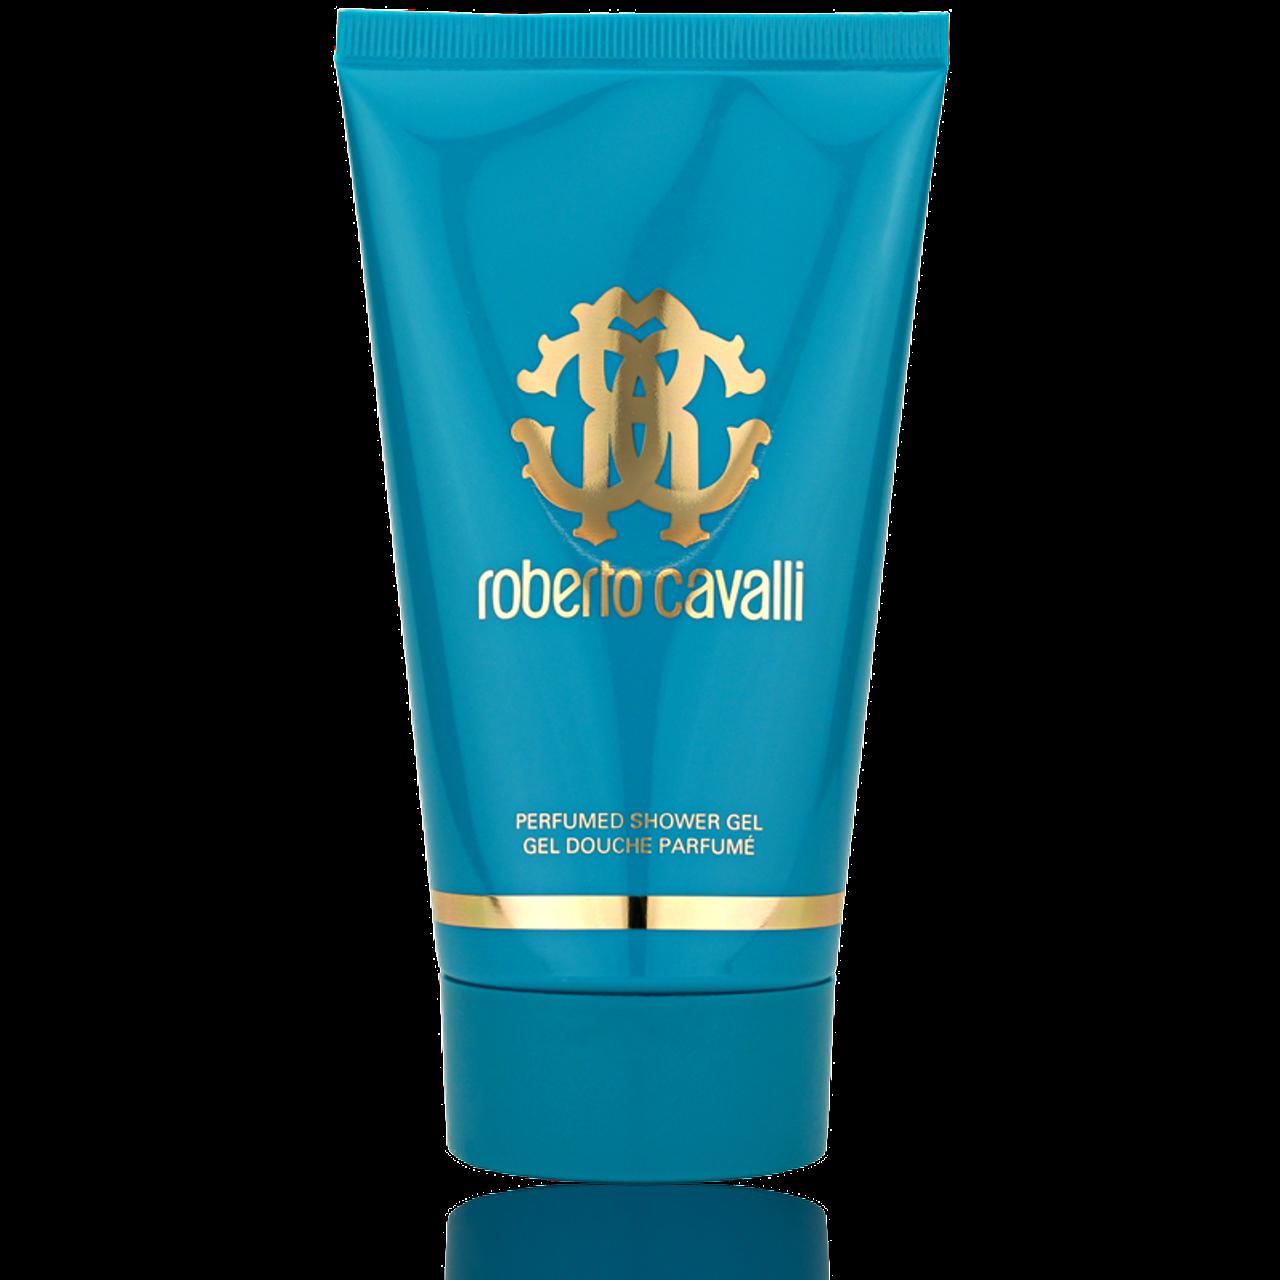 Roberto Cavalli Acqua Shower Gel 150ml